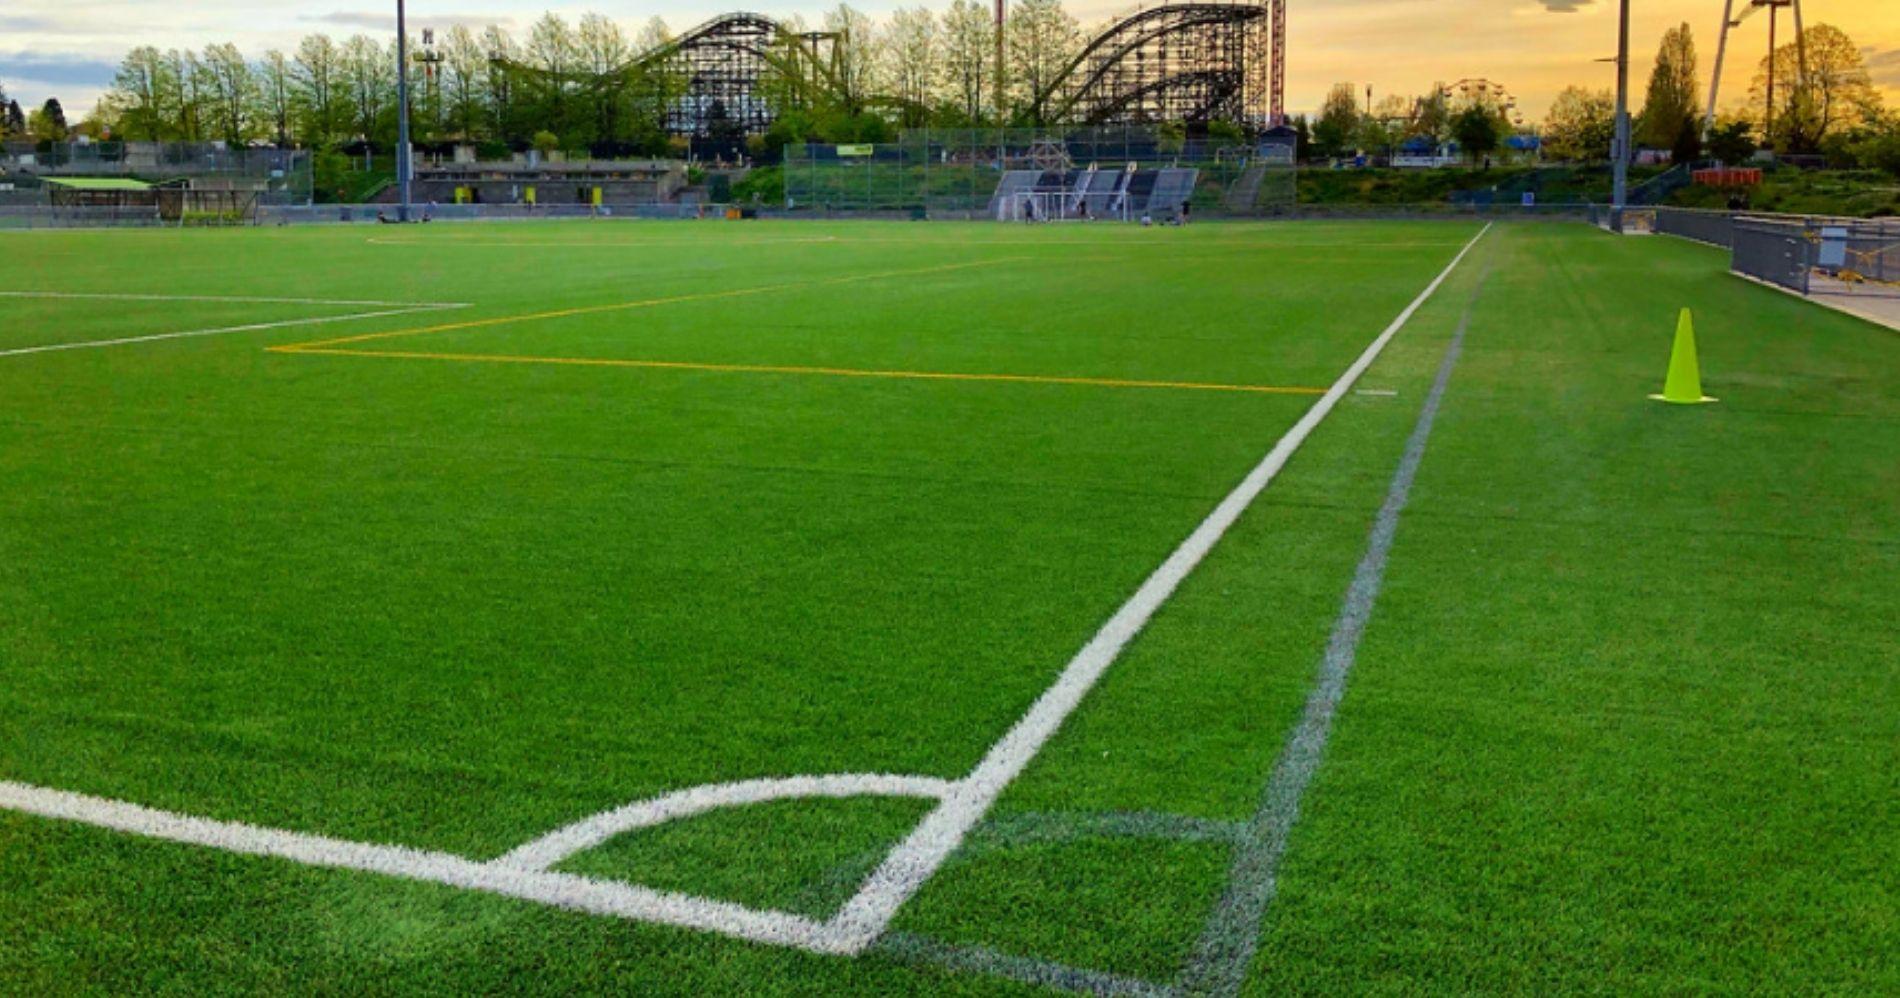 Football Illustration Web Bisnis Muda - Image: Flickr